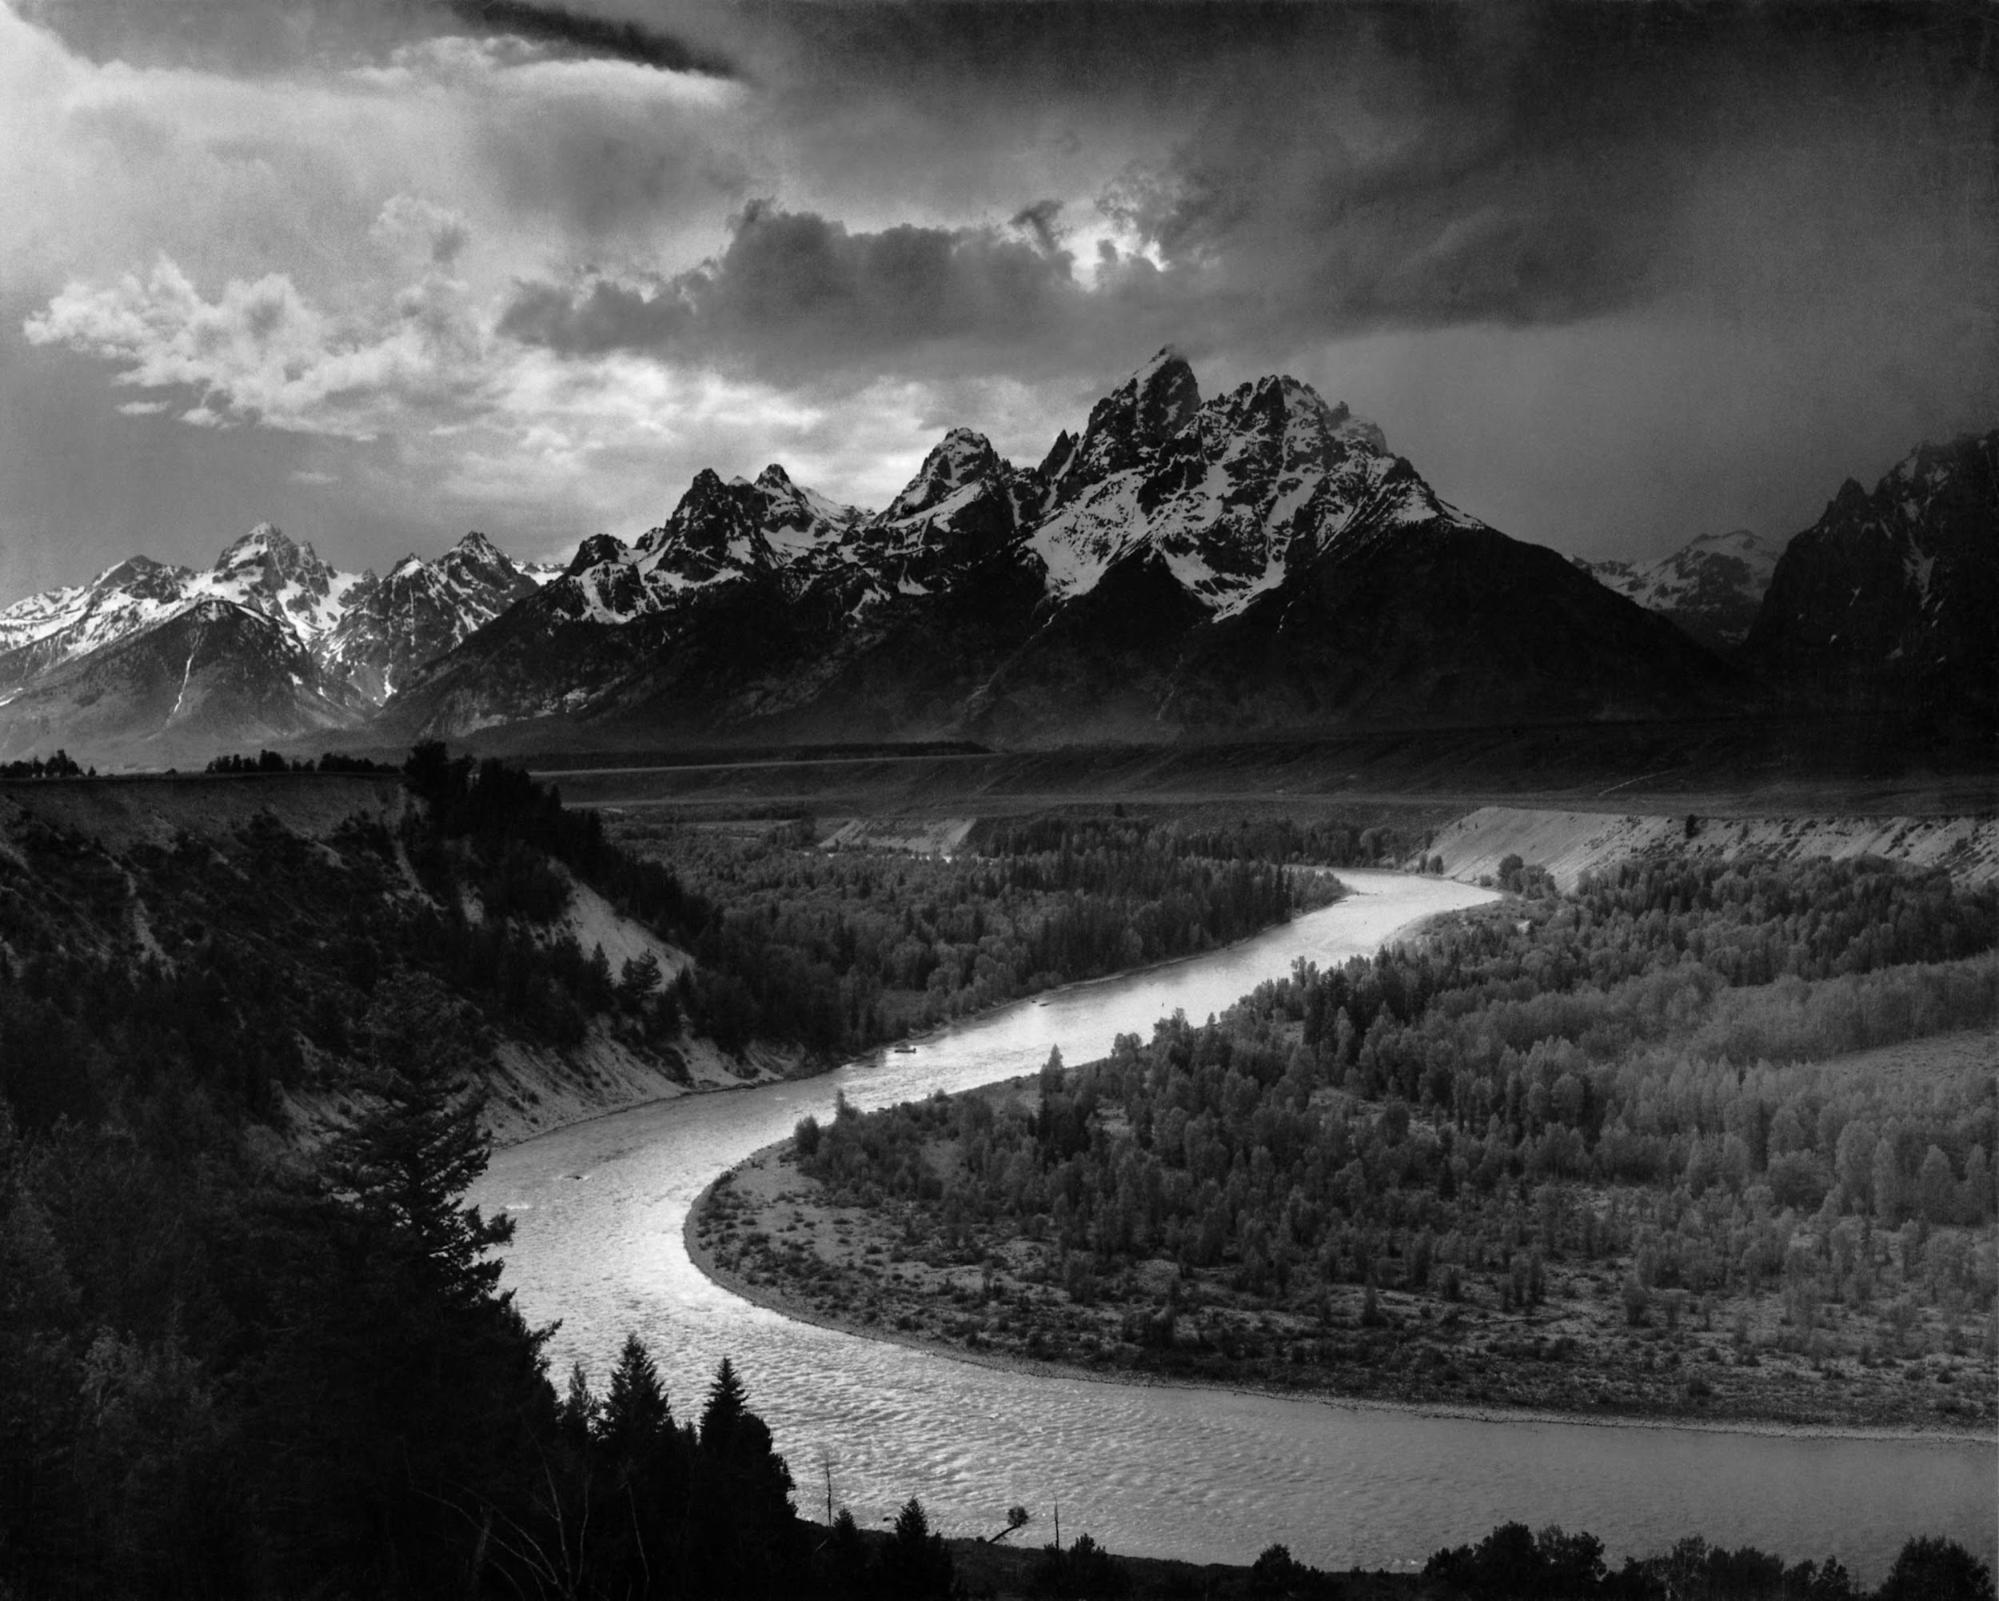 Die Tetons und der Snake River, Wyoming, USA, 1942 © Ansel Adams